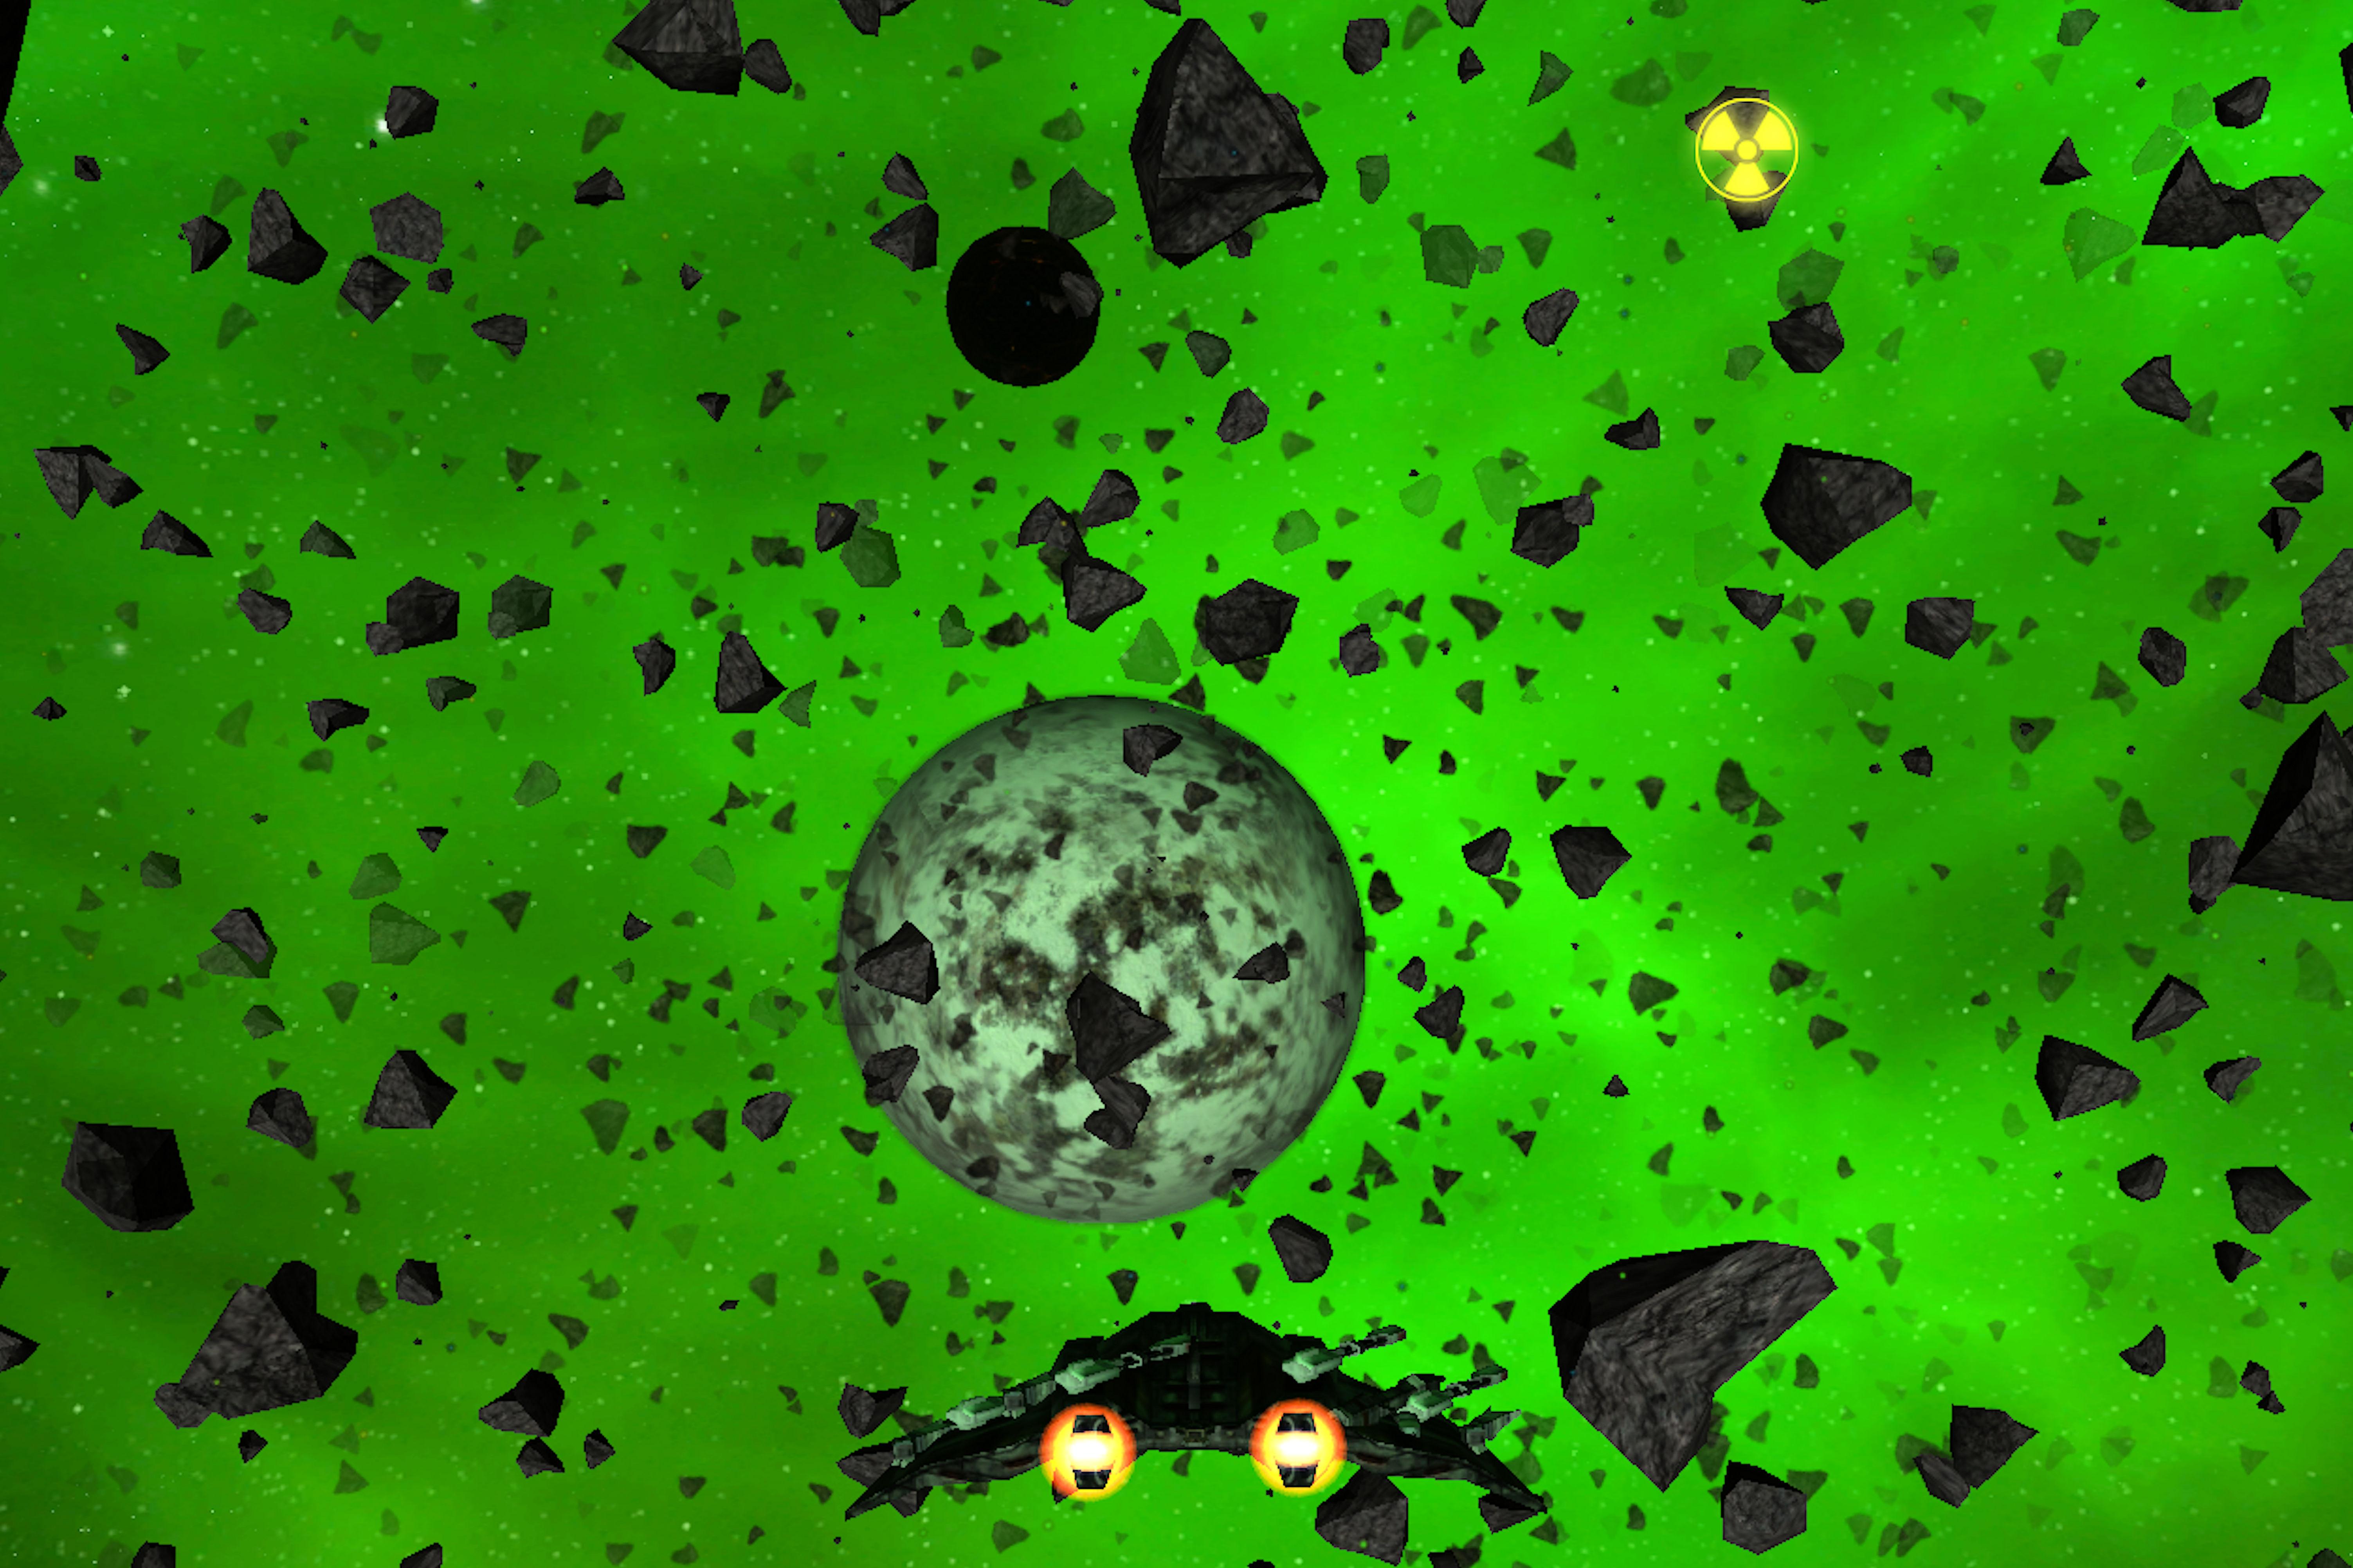 PlanetNovis_PlanetCanaan.jpg